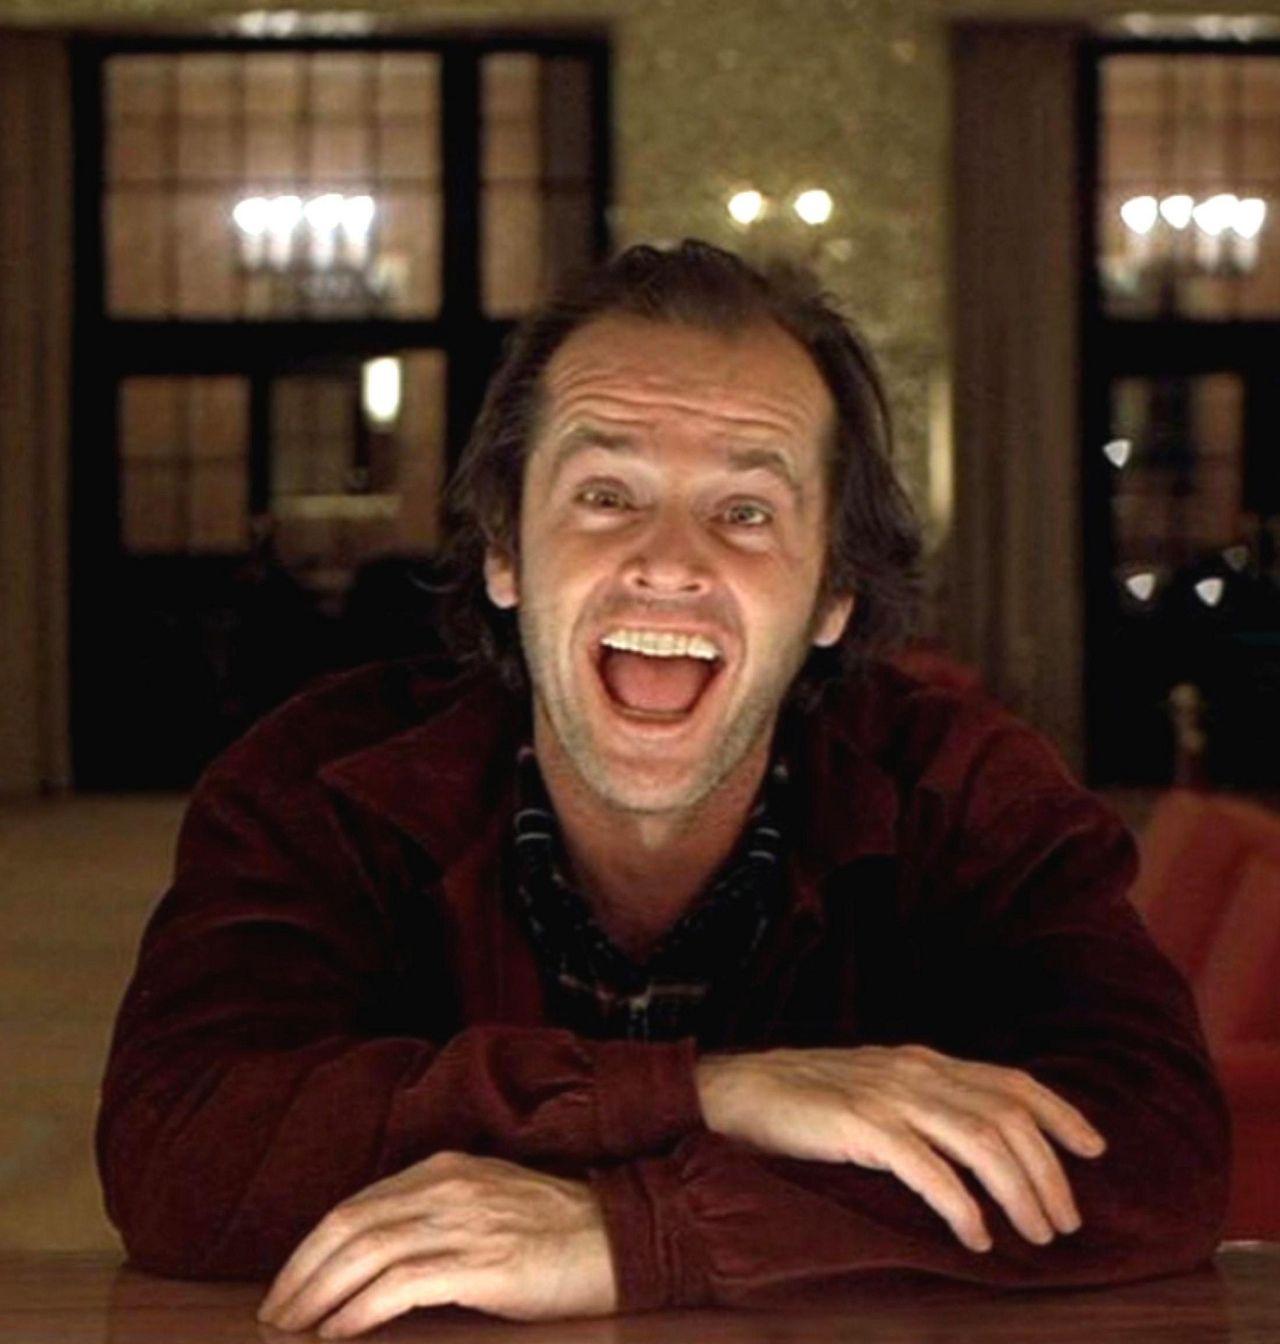 Jack Nicholson As Jack Torrance The Shining 1980 Jack Nicholson The Shining Film The Shining